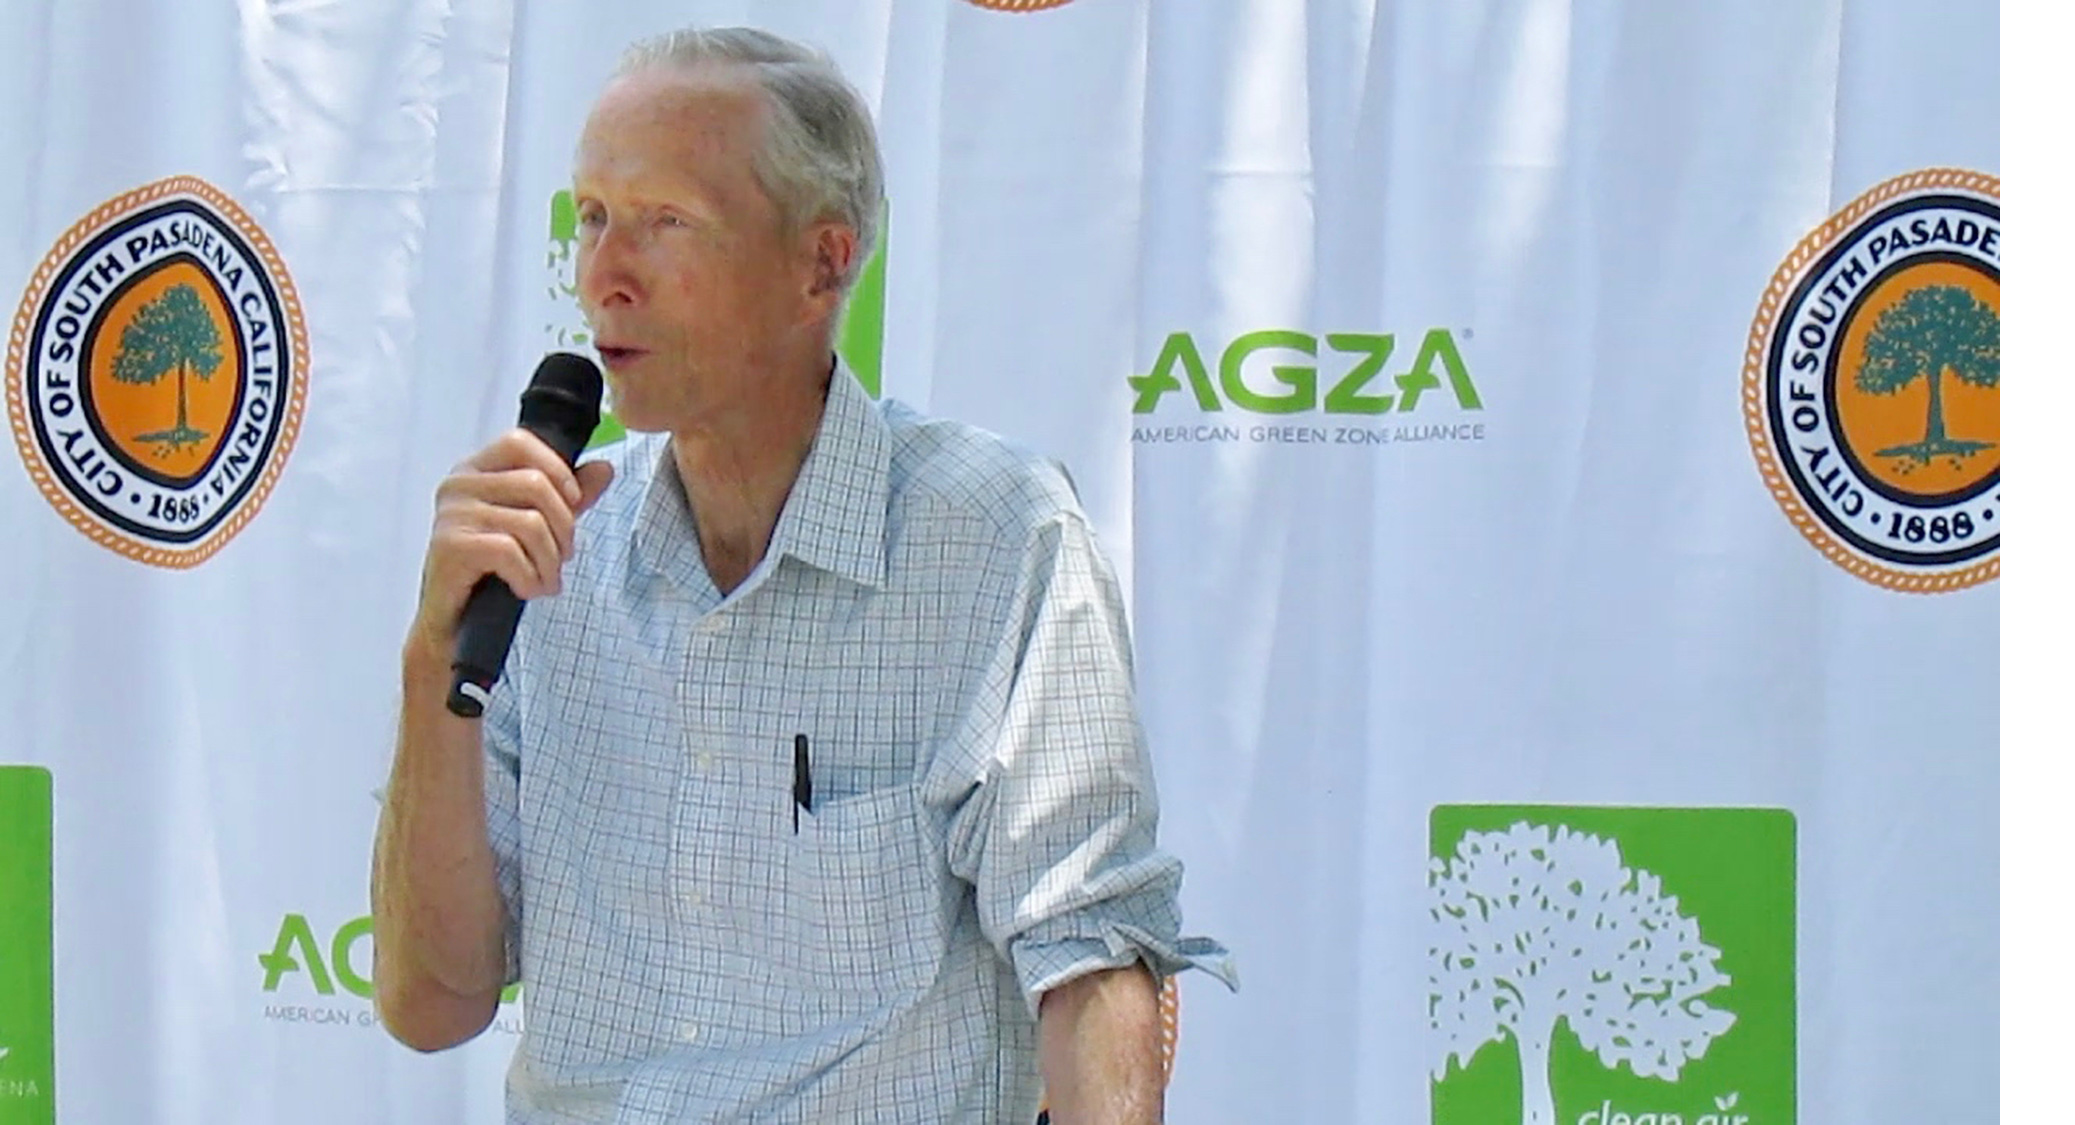 AGZA_GZ_ASGC_speaker_Don_Bremner_close_2000_margin.jpg